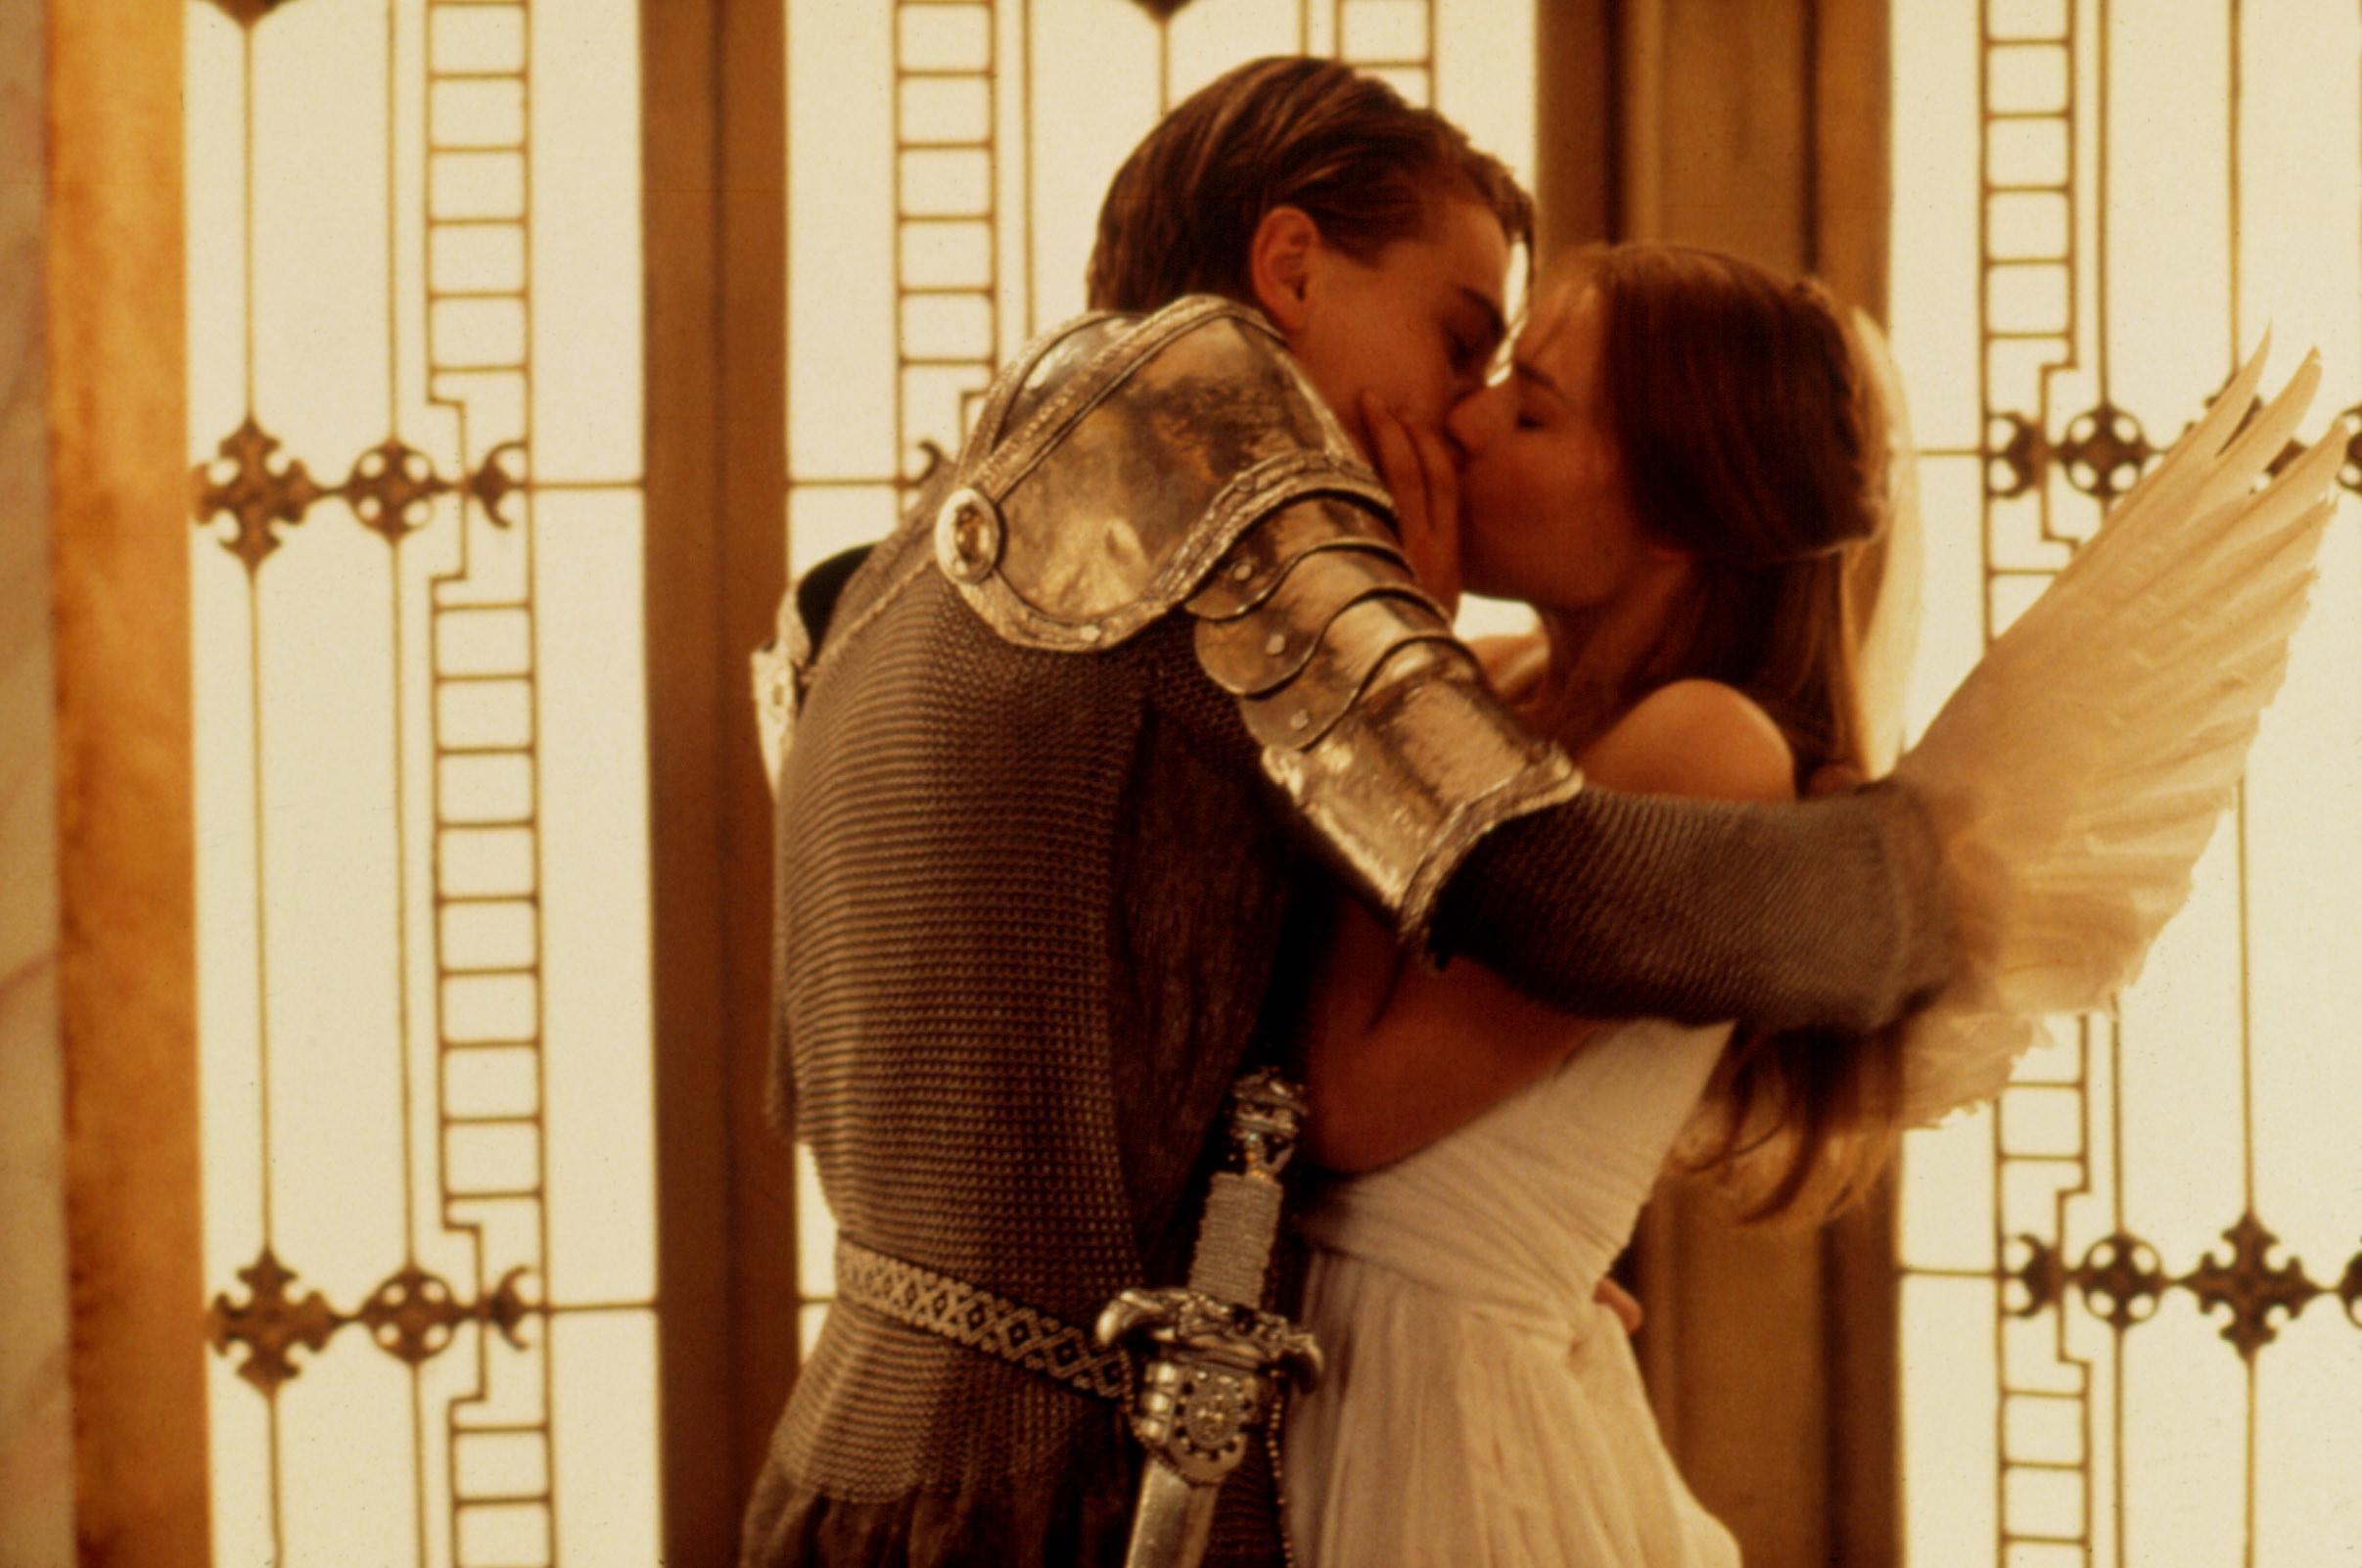 Leonardo Di Caprio dressed as a knight kisses Claire Danes dressed like an angel